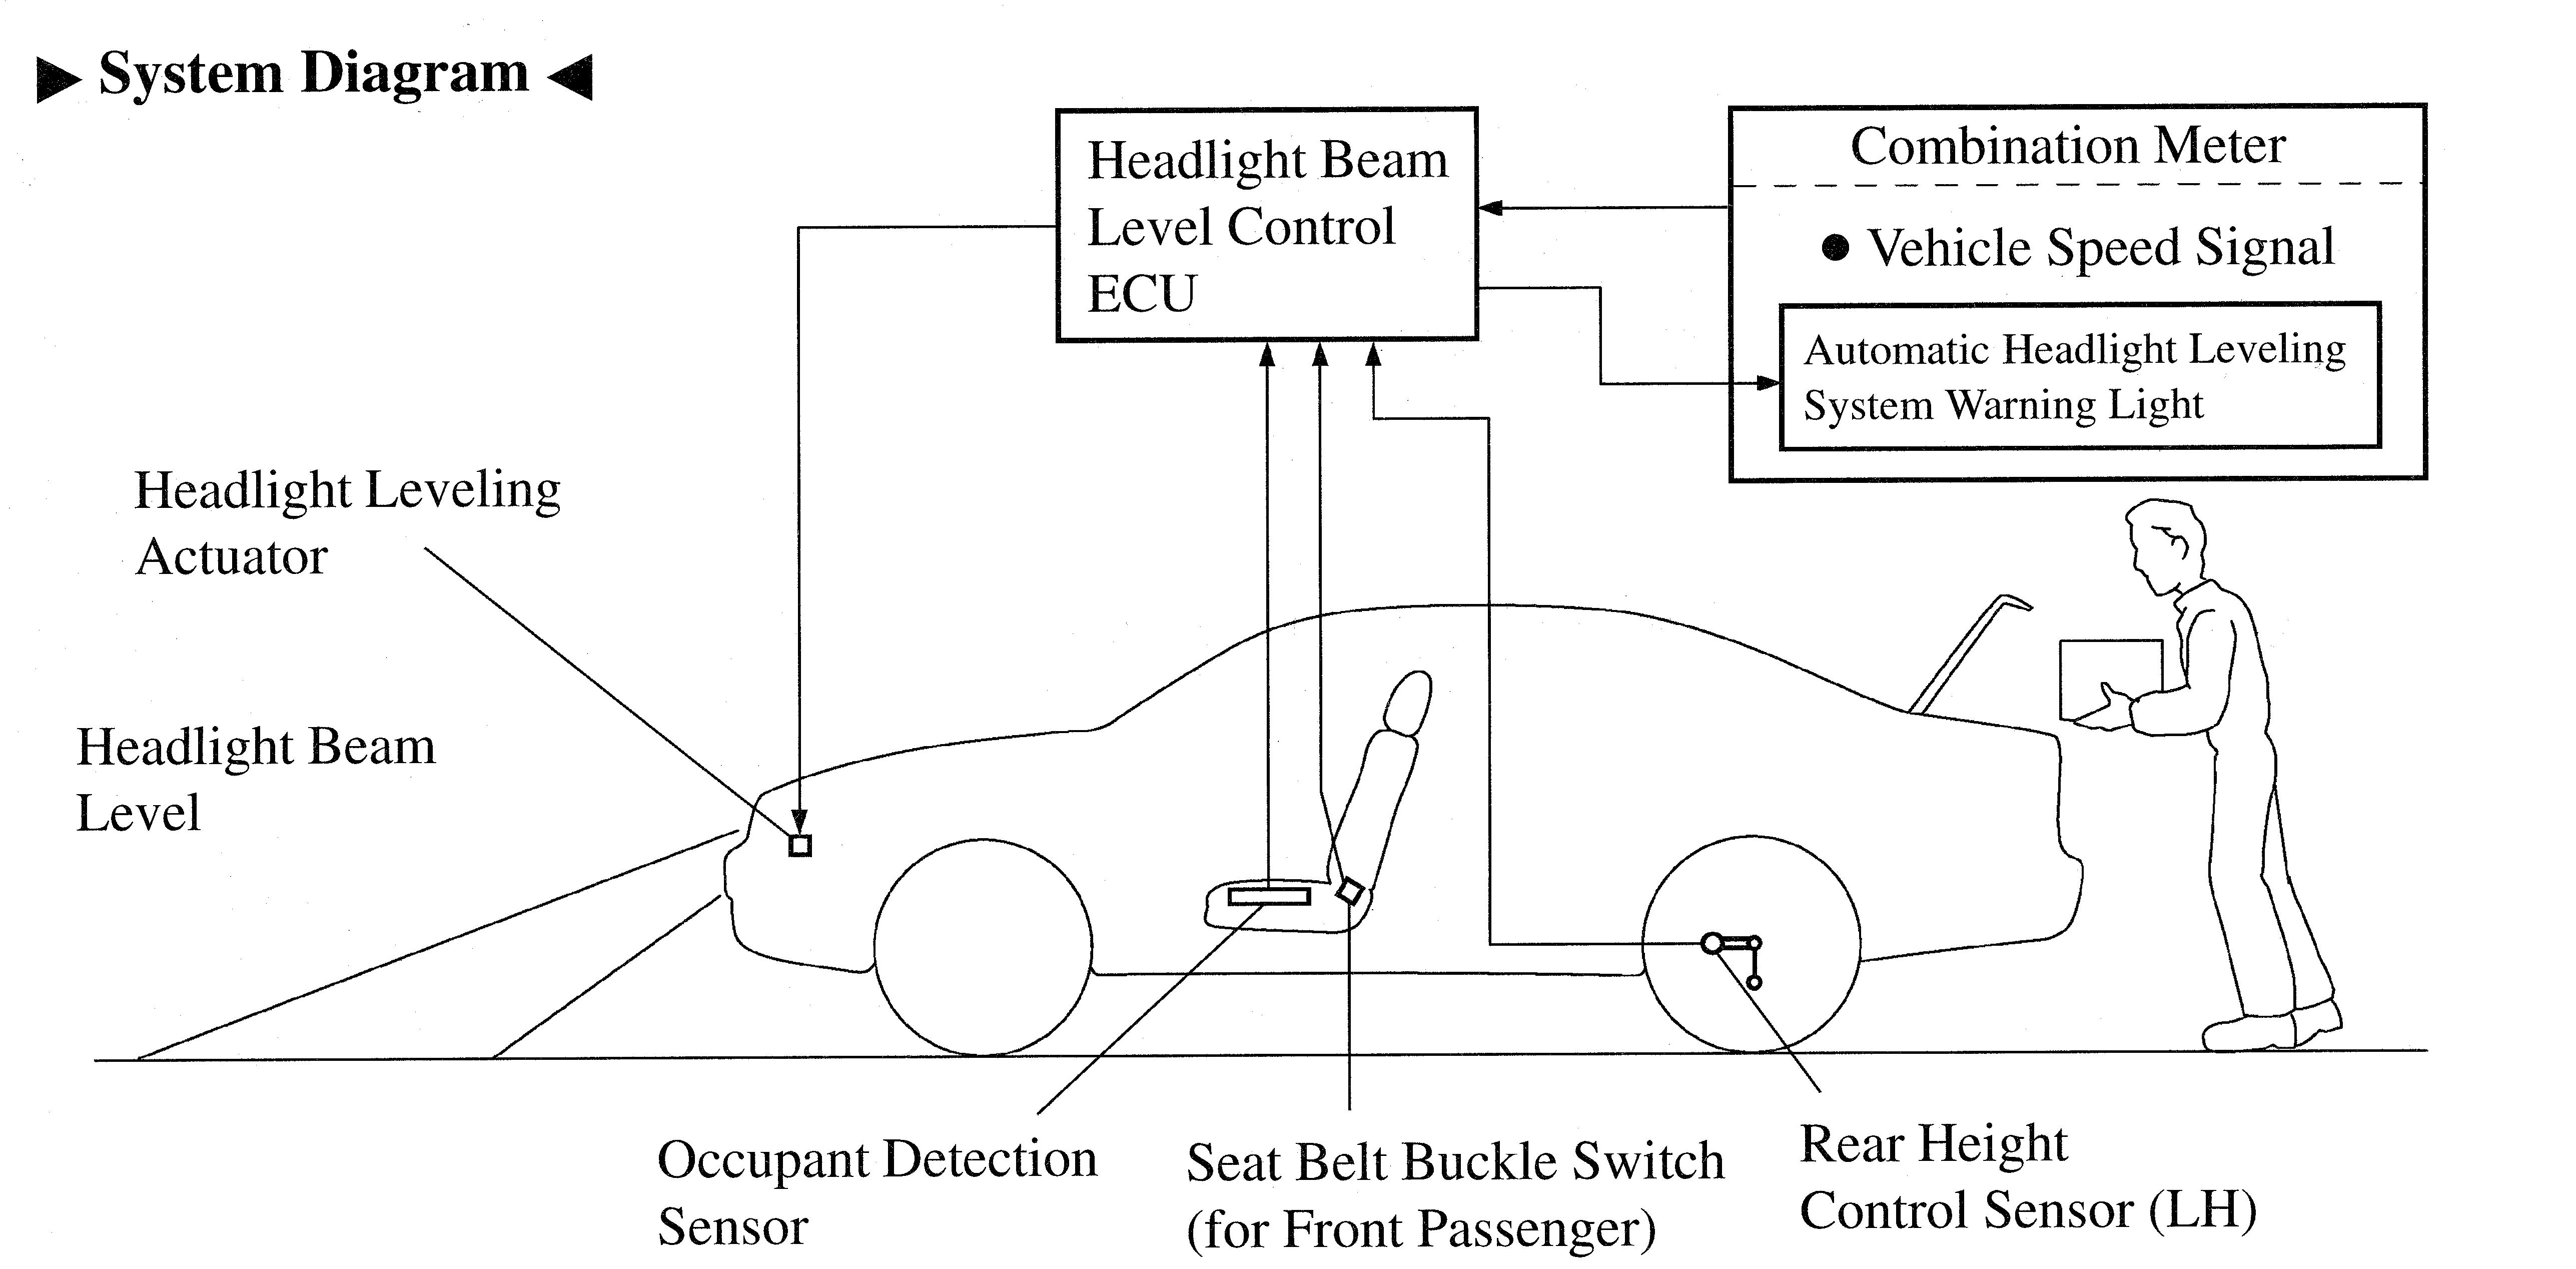 2002 toyota celica wiring diagram basic street rod tacoma engine library